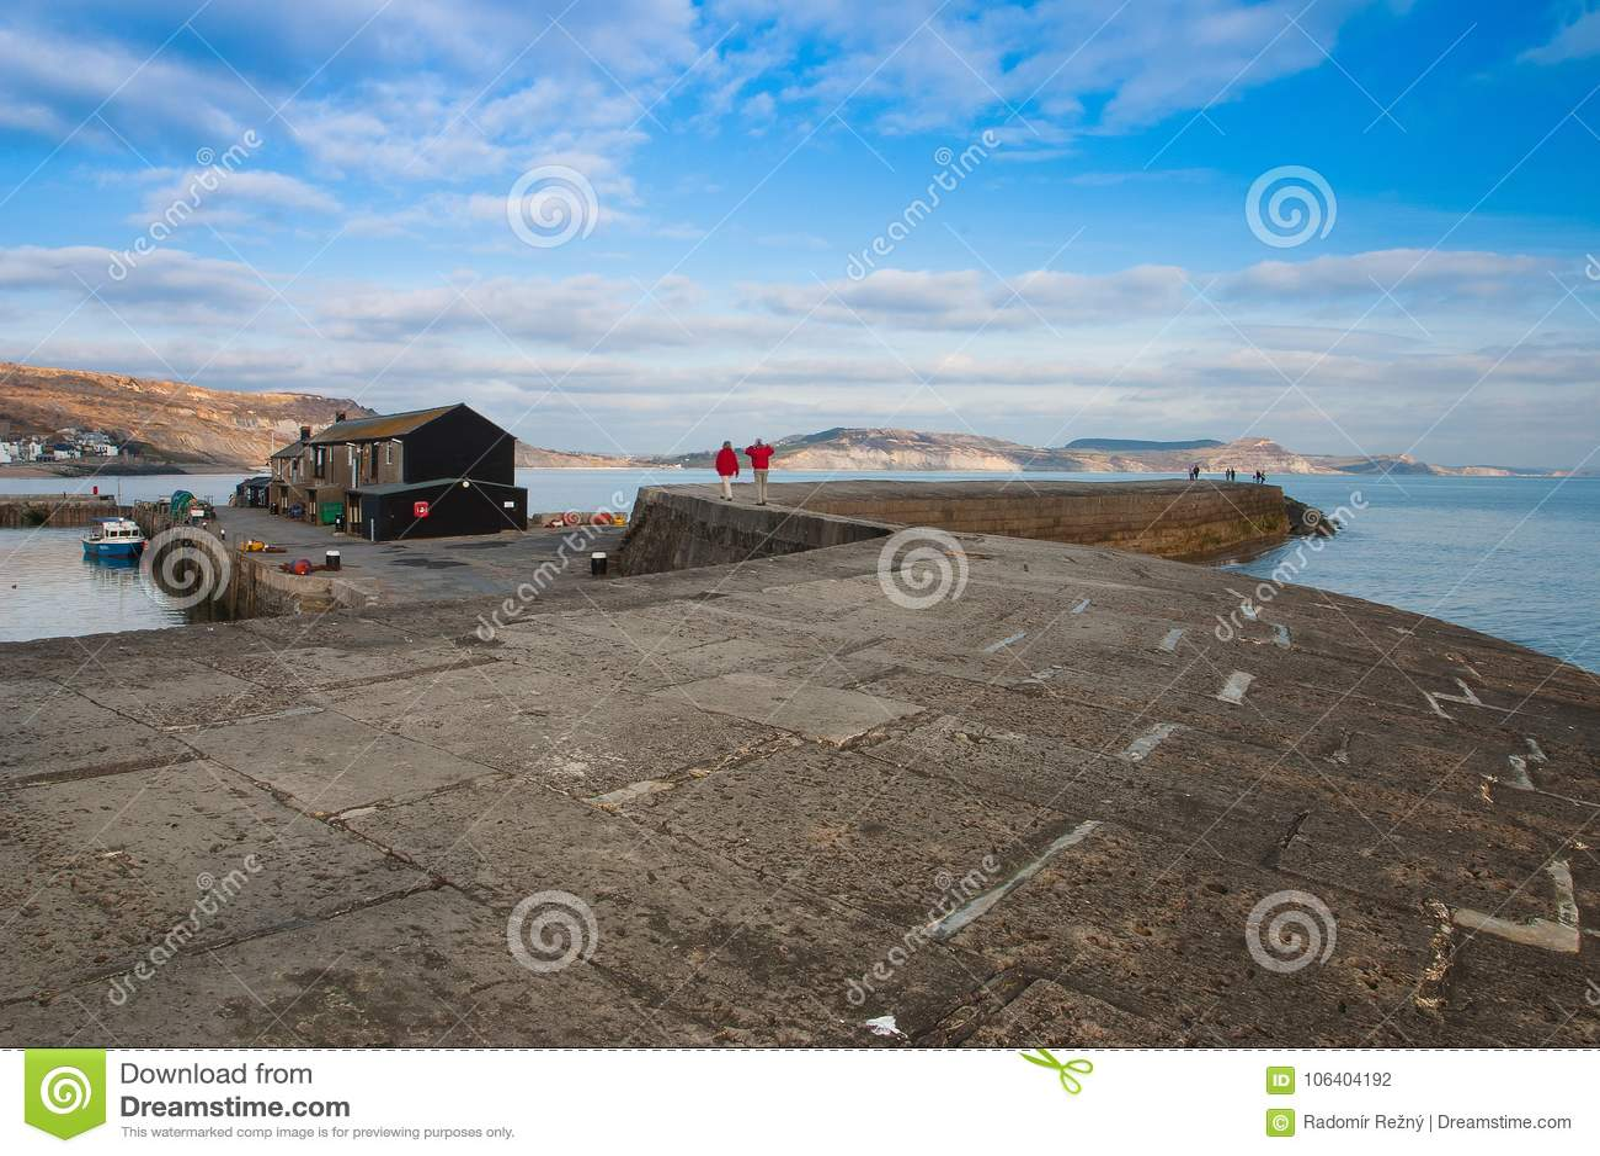 El cobb famoso en Lyme Regis, Inglaterra